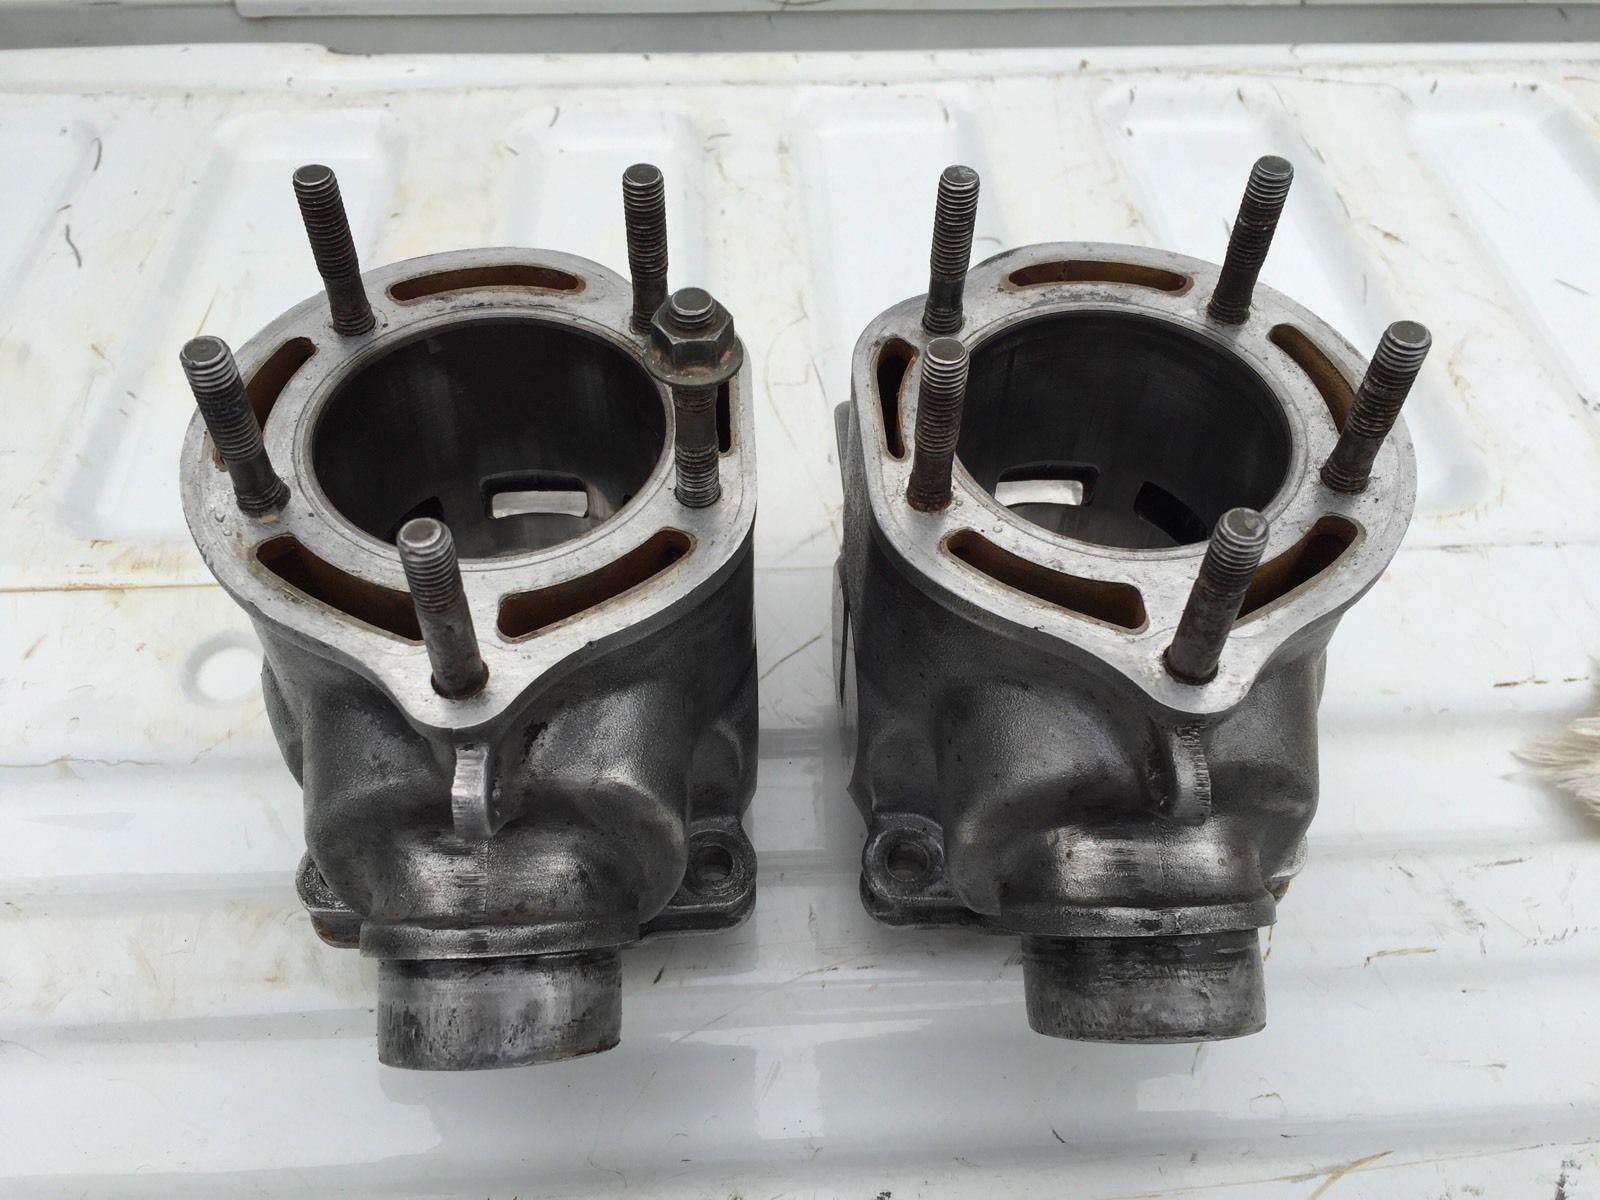 hight resolution of banshee ported 66mm stock cylinders with pistons with pistons cylinders stock ported banshee